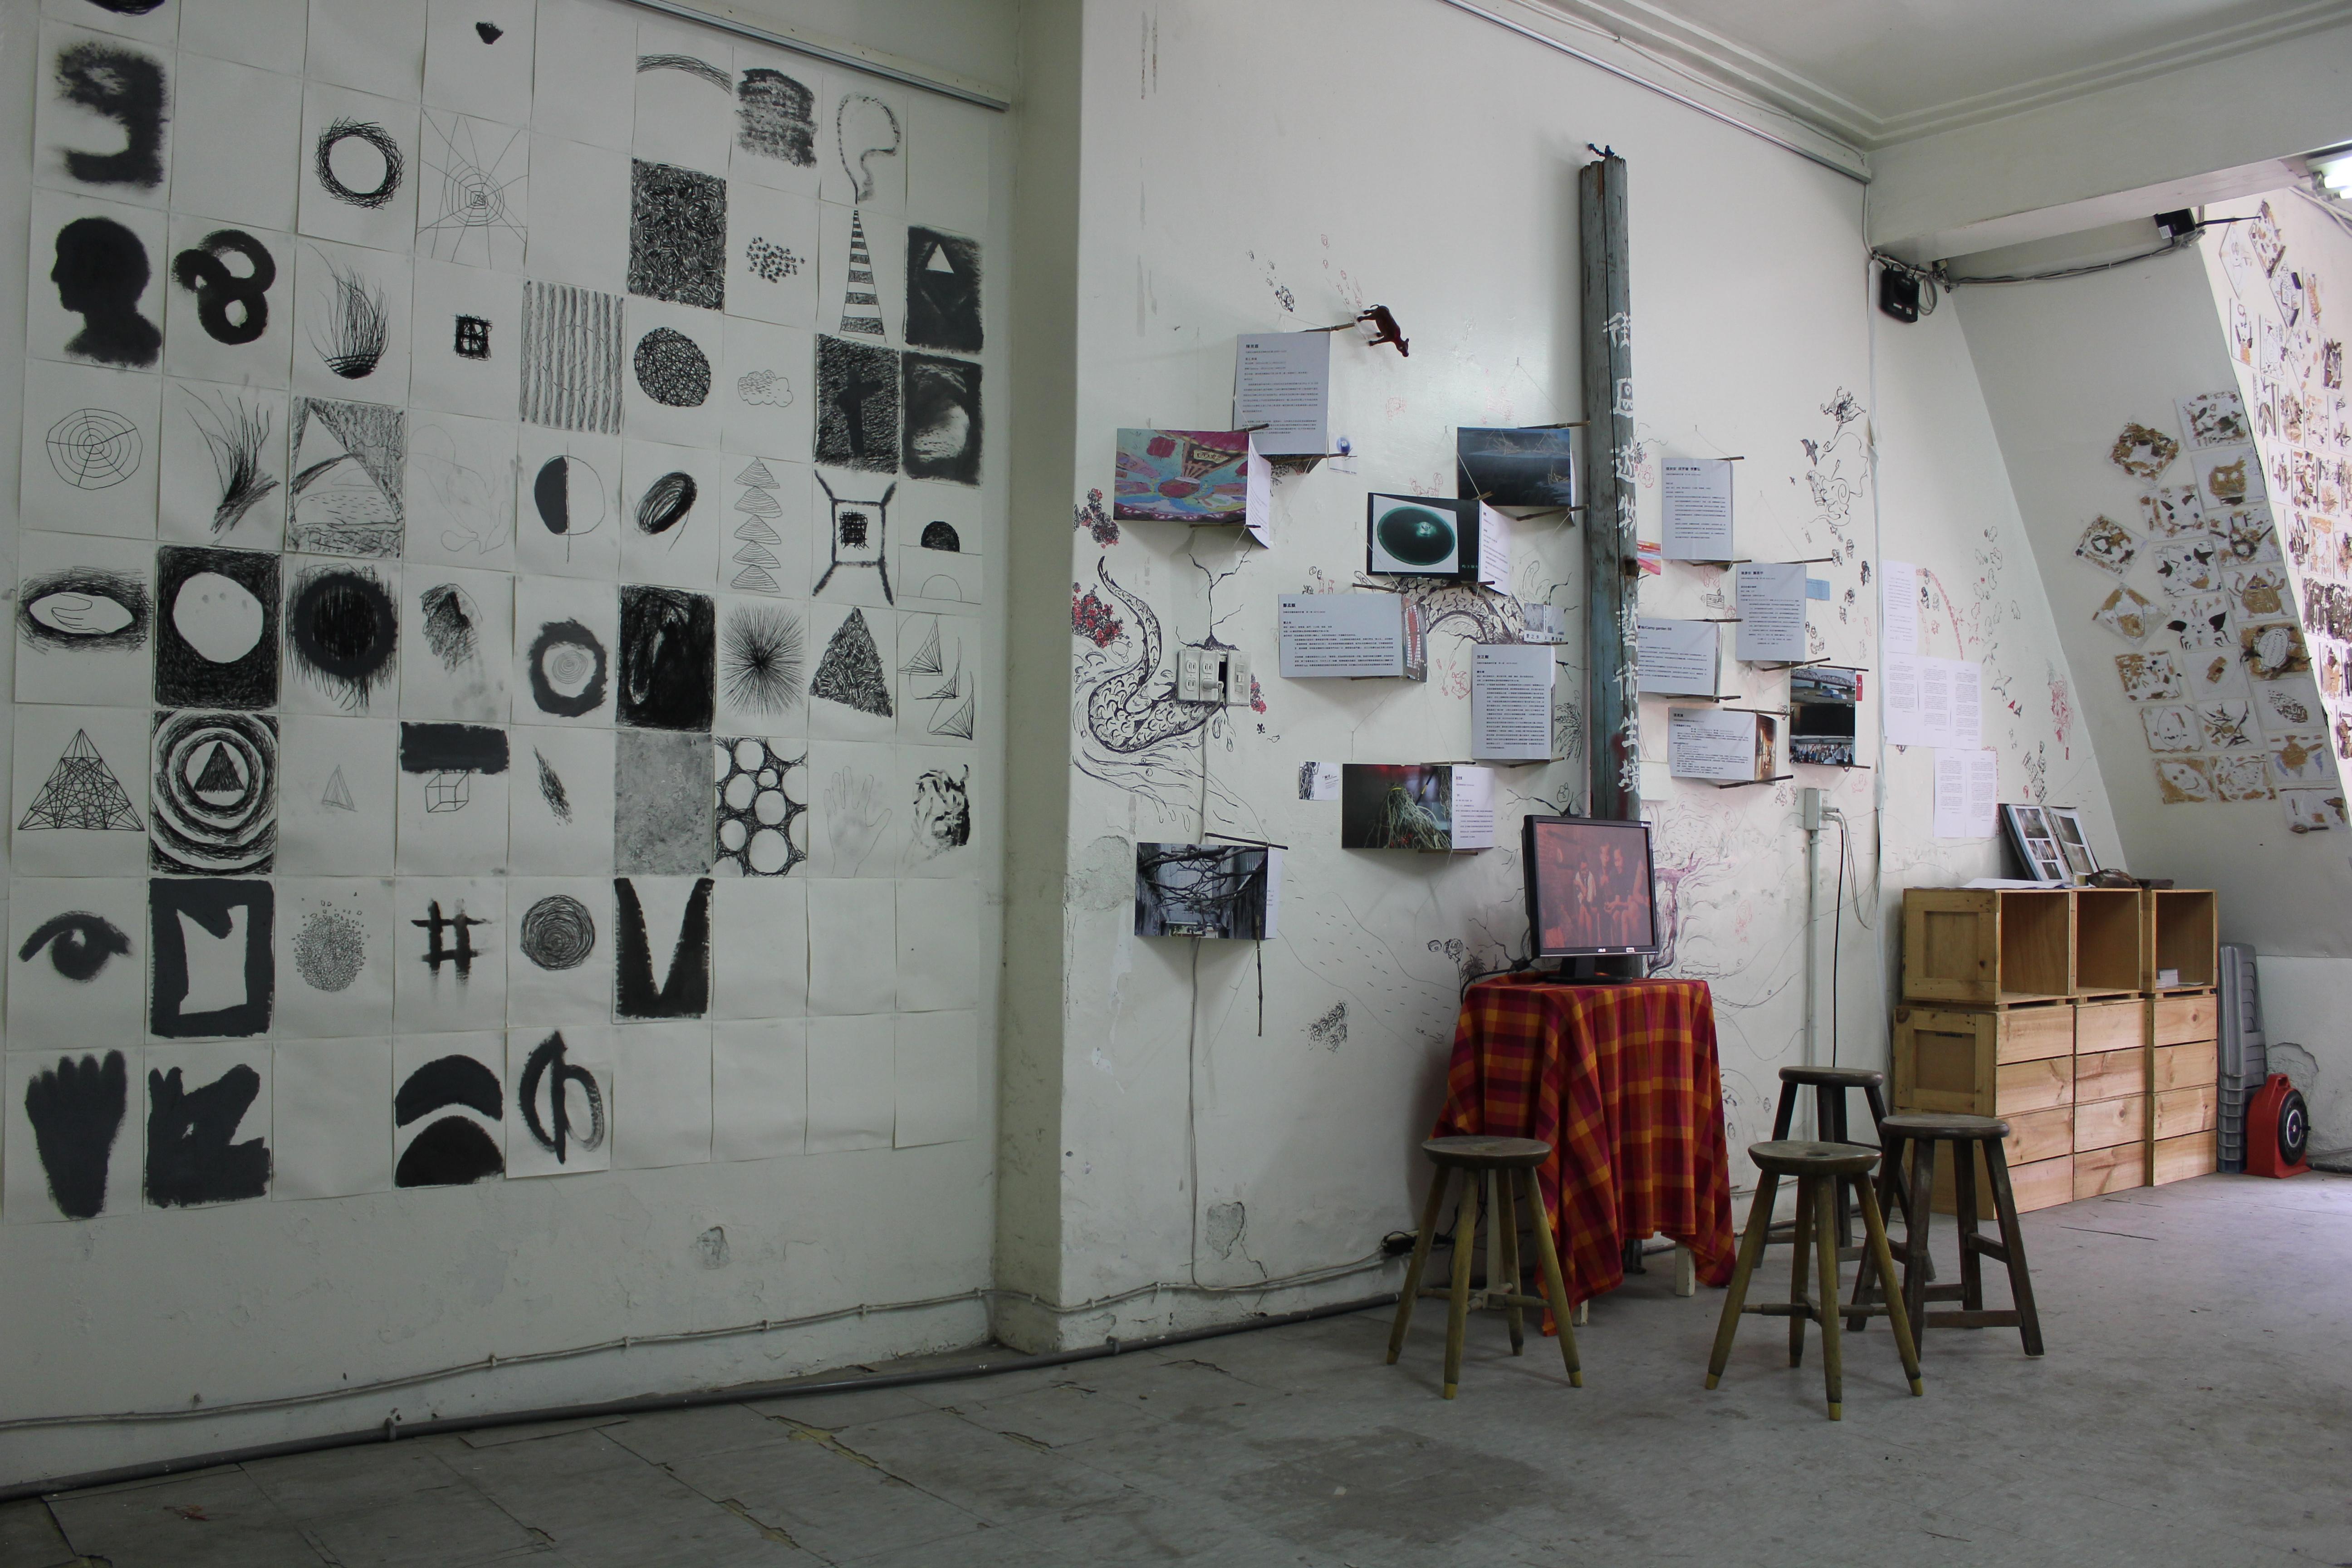 移址殖地 Art Resident Tranform (2)